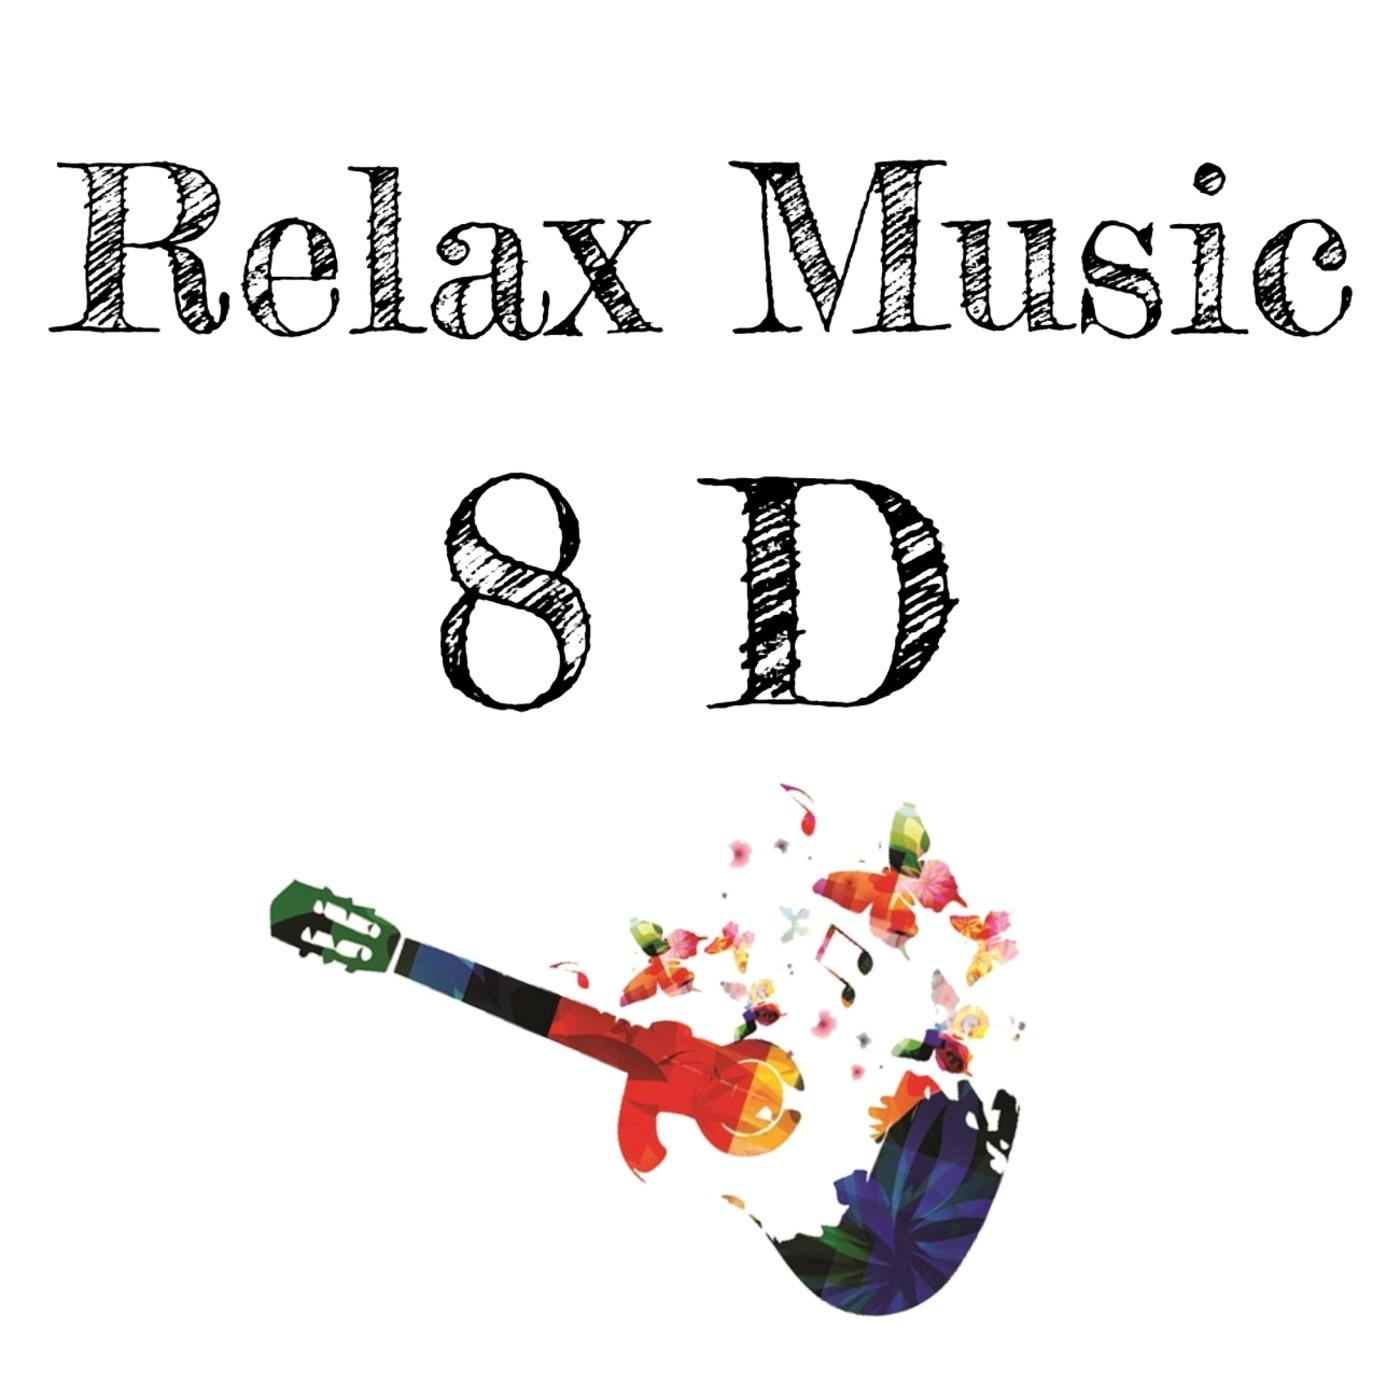 Musica 8D para estudiar/trabajar - Musica relajante 8D Chillout